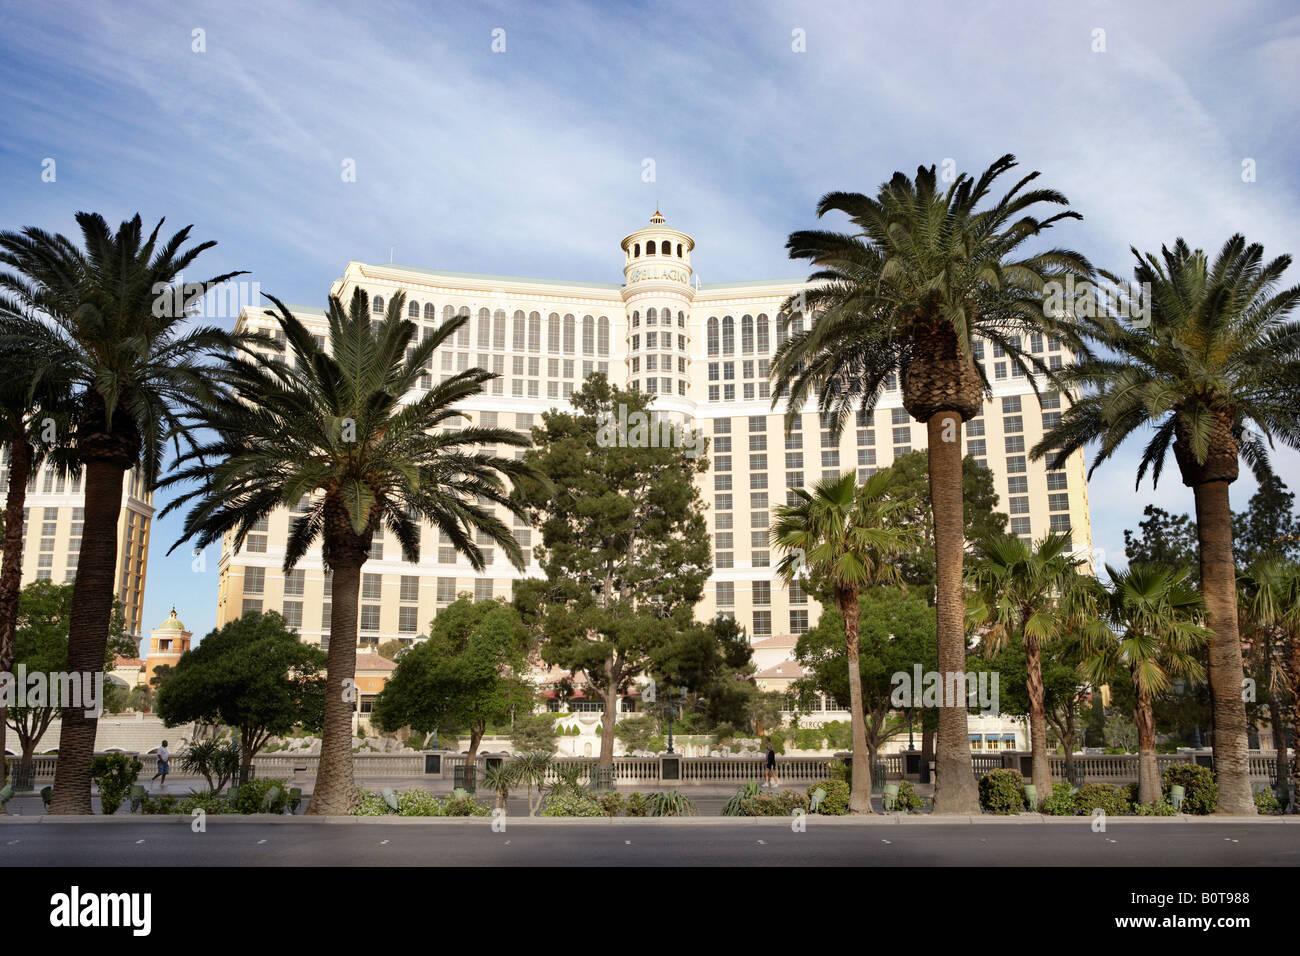 View of Bellagio Hotel Casino in Las Vegas Nevada USA - Stock Image